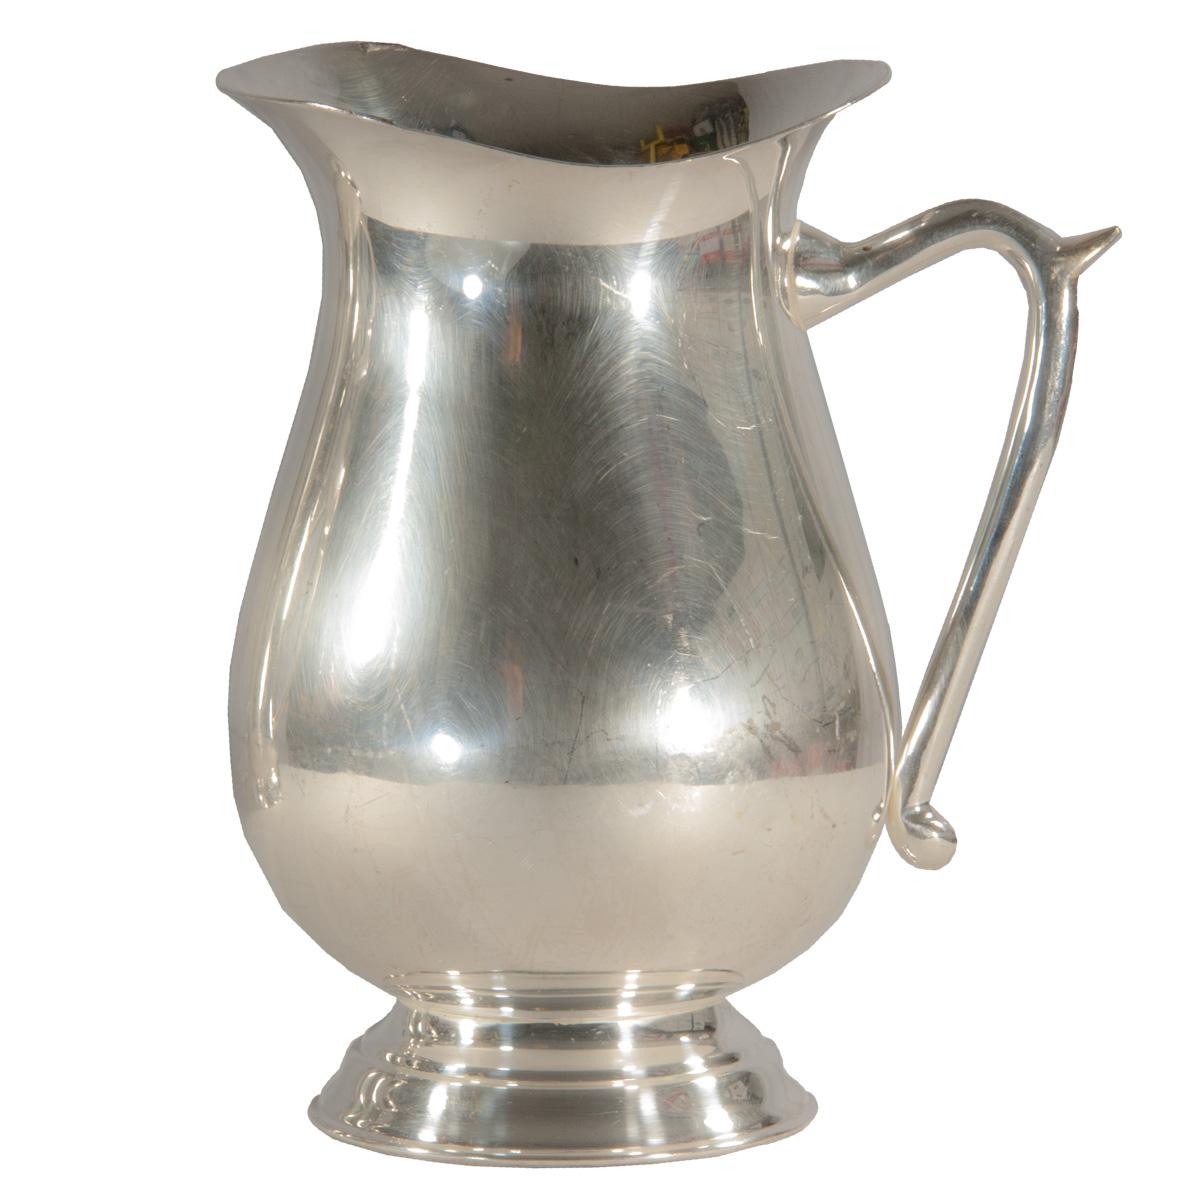 silver water pitcher 64 oz celebrations party rentals. Black Bedroom Furniture Sets. Home Design Ideas